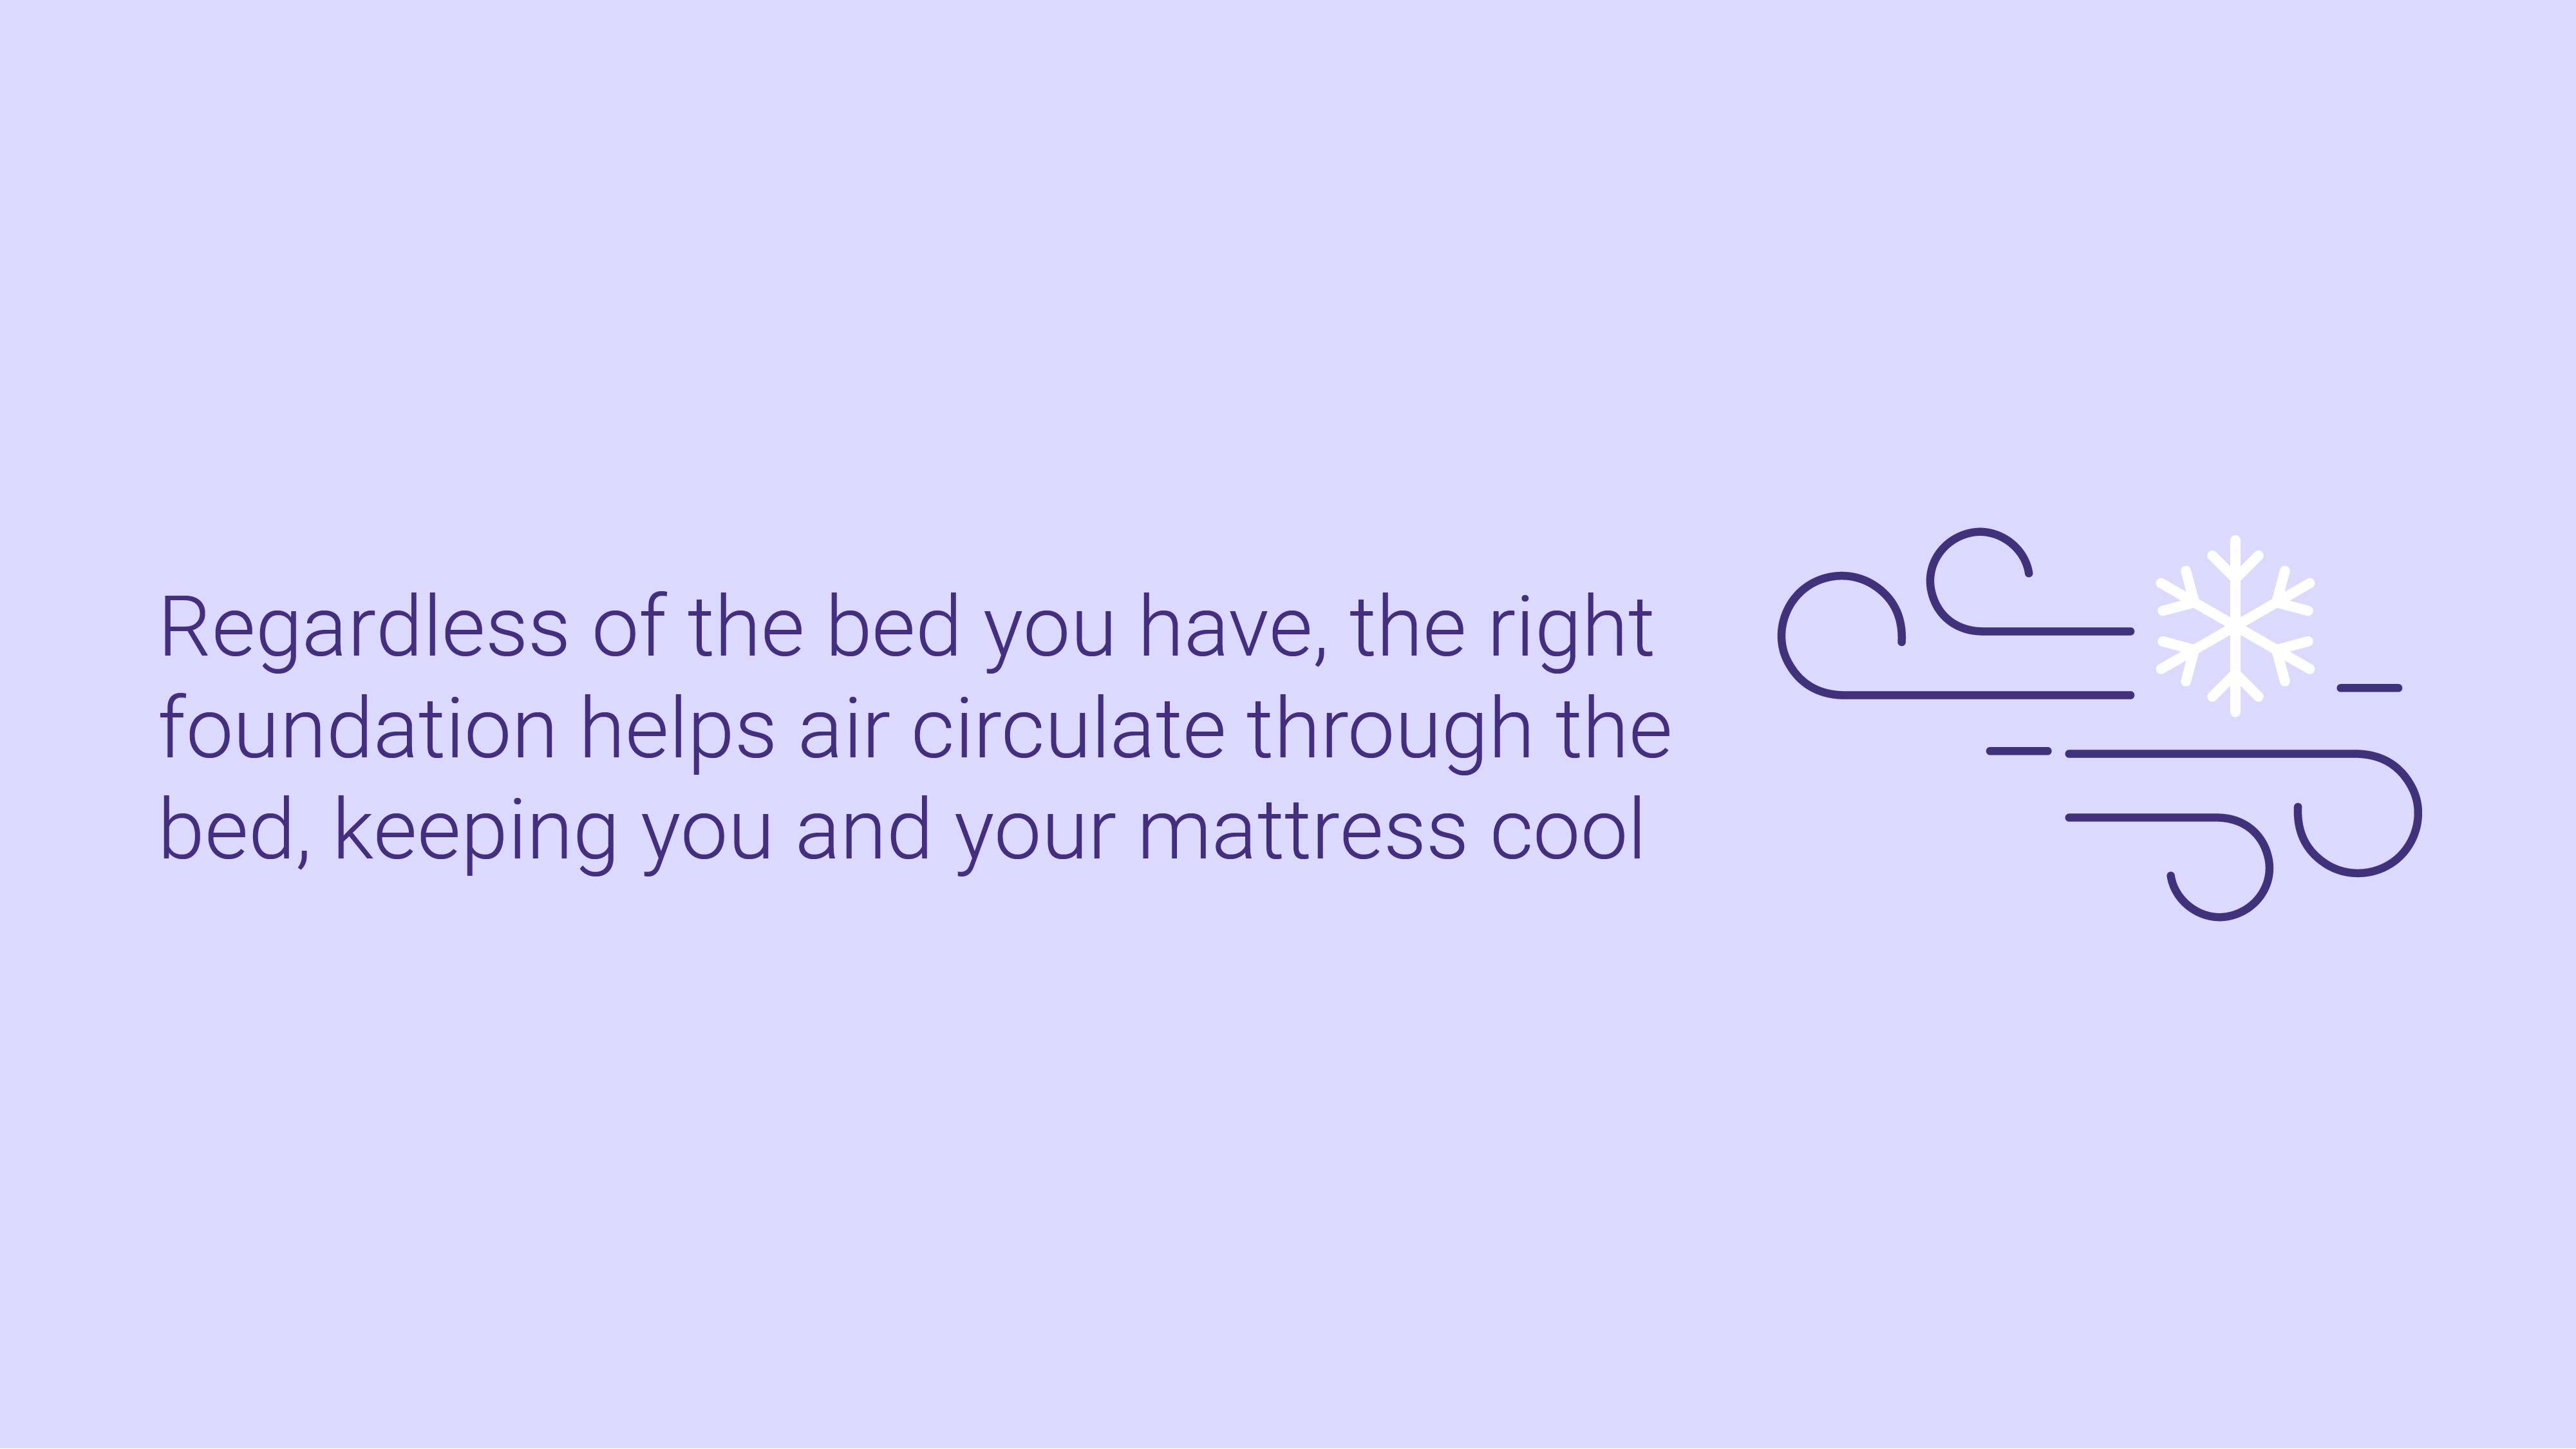 mattress-foundation